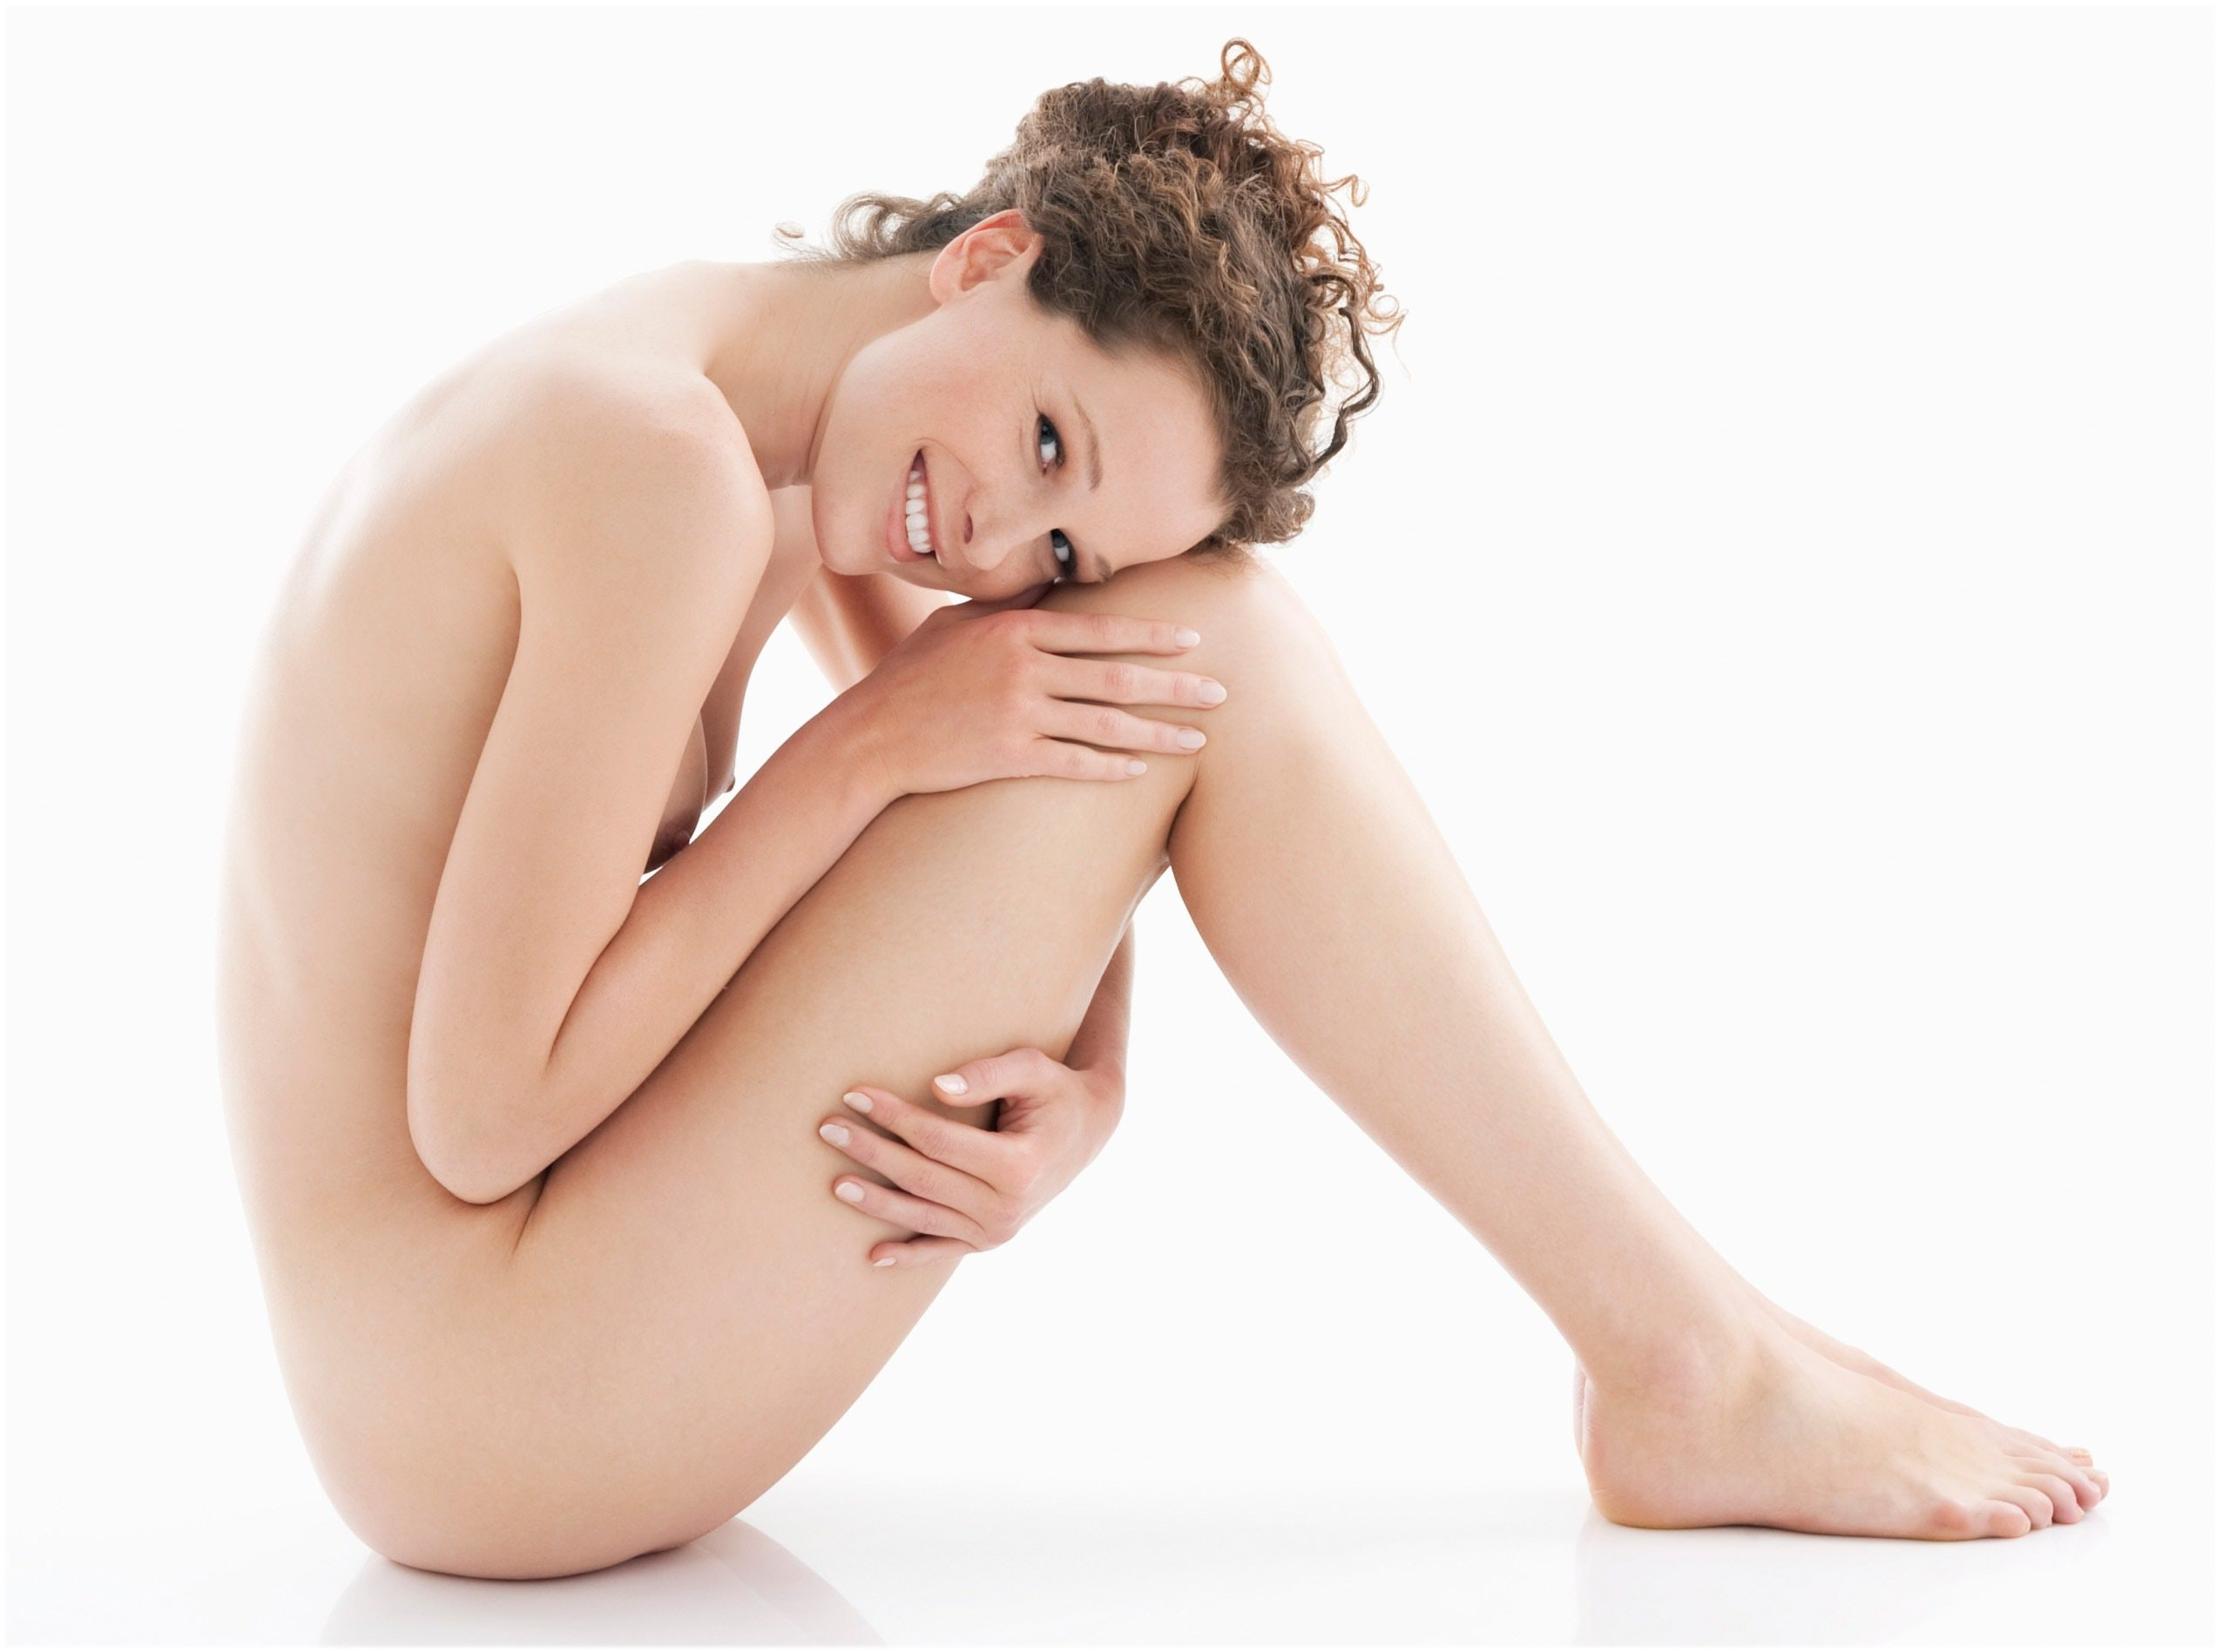 massageklinik esbjerg escort pige århus tilbud tantra massage